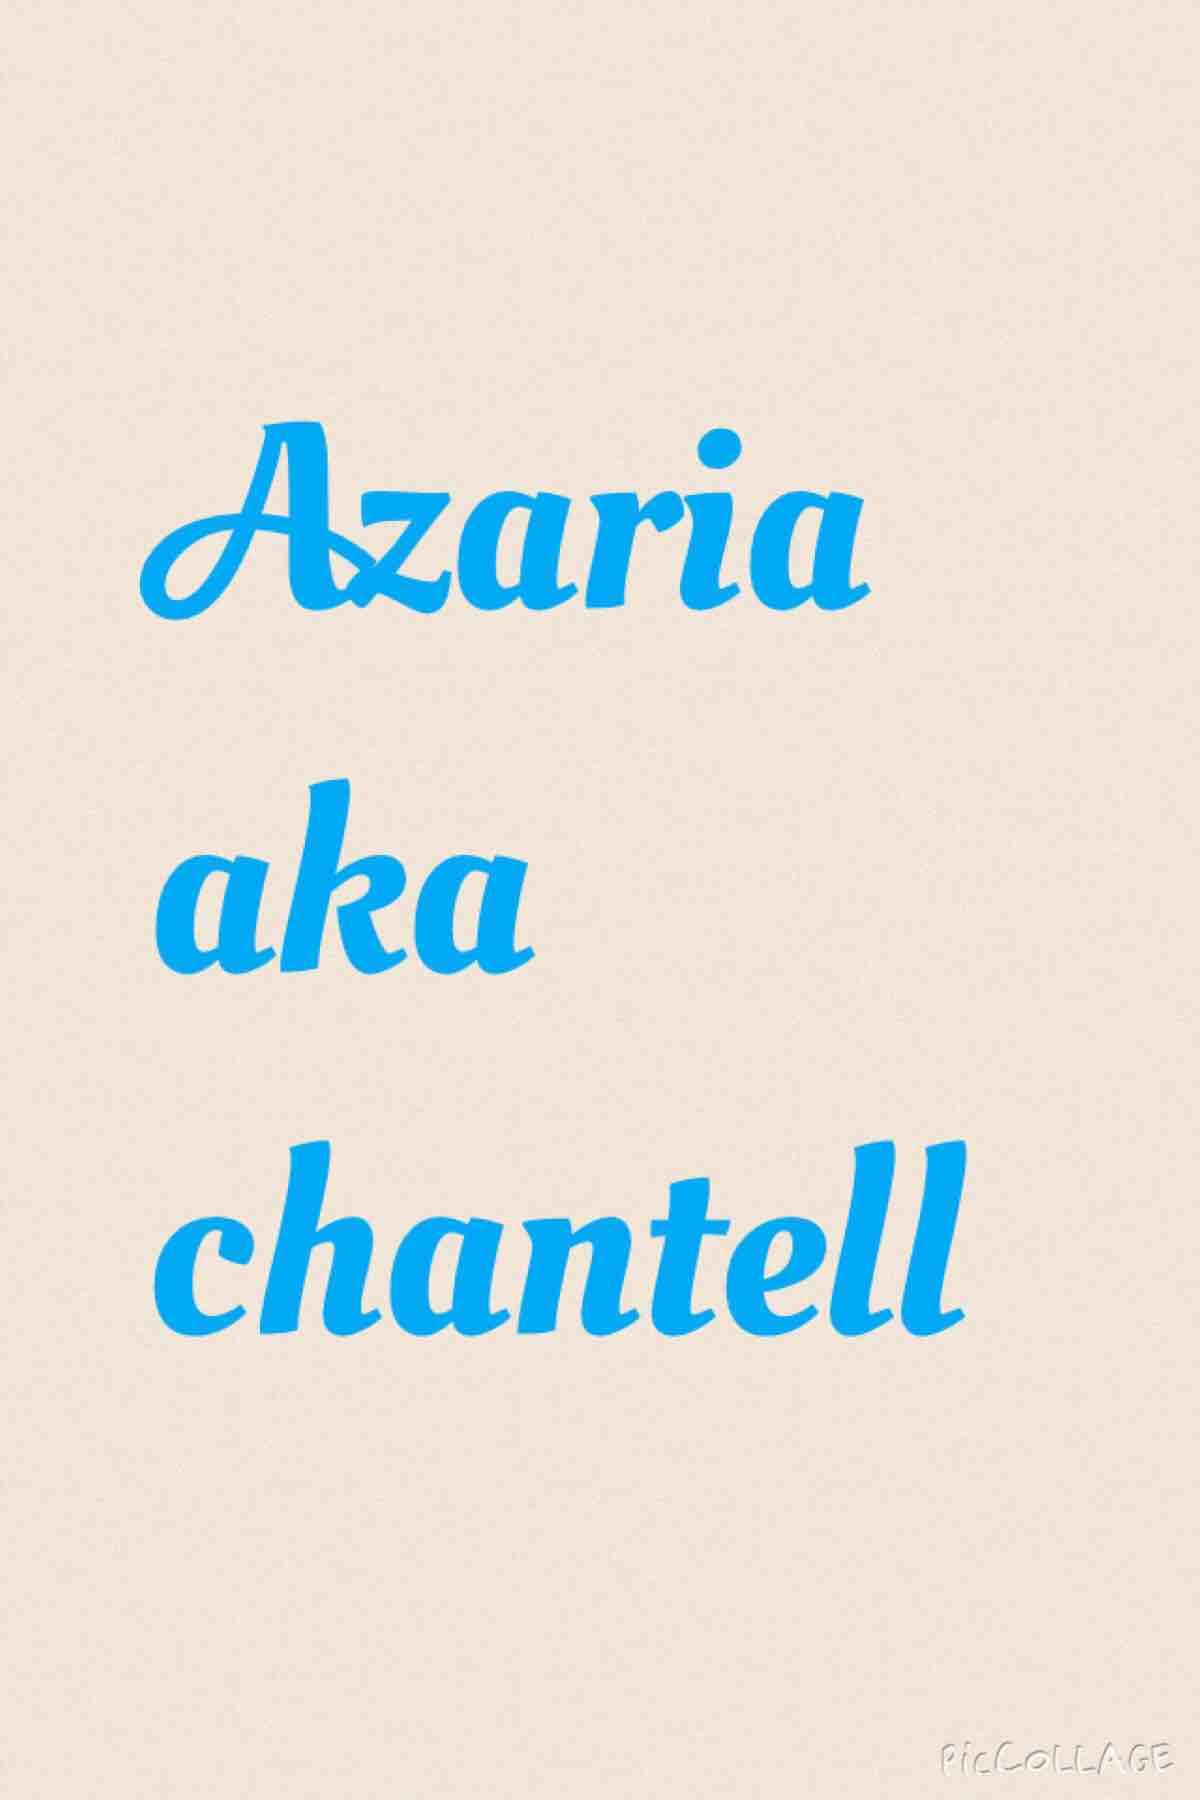 Azaria Ponder AKA Chantell